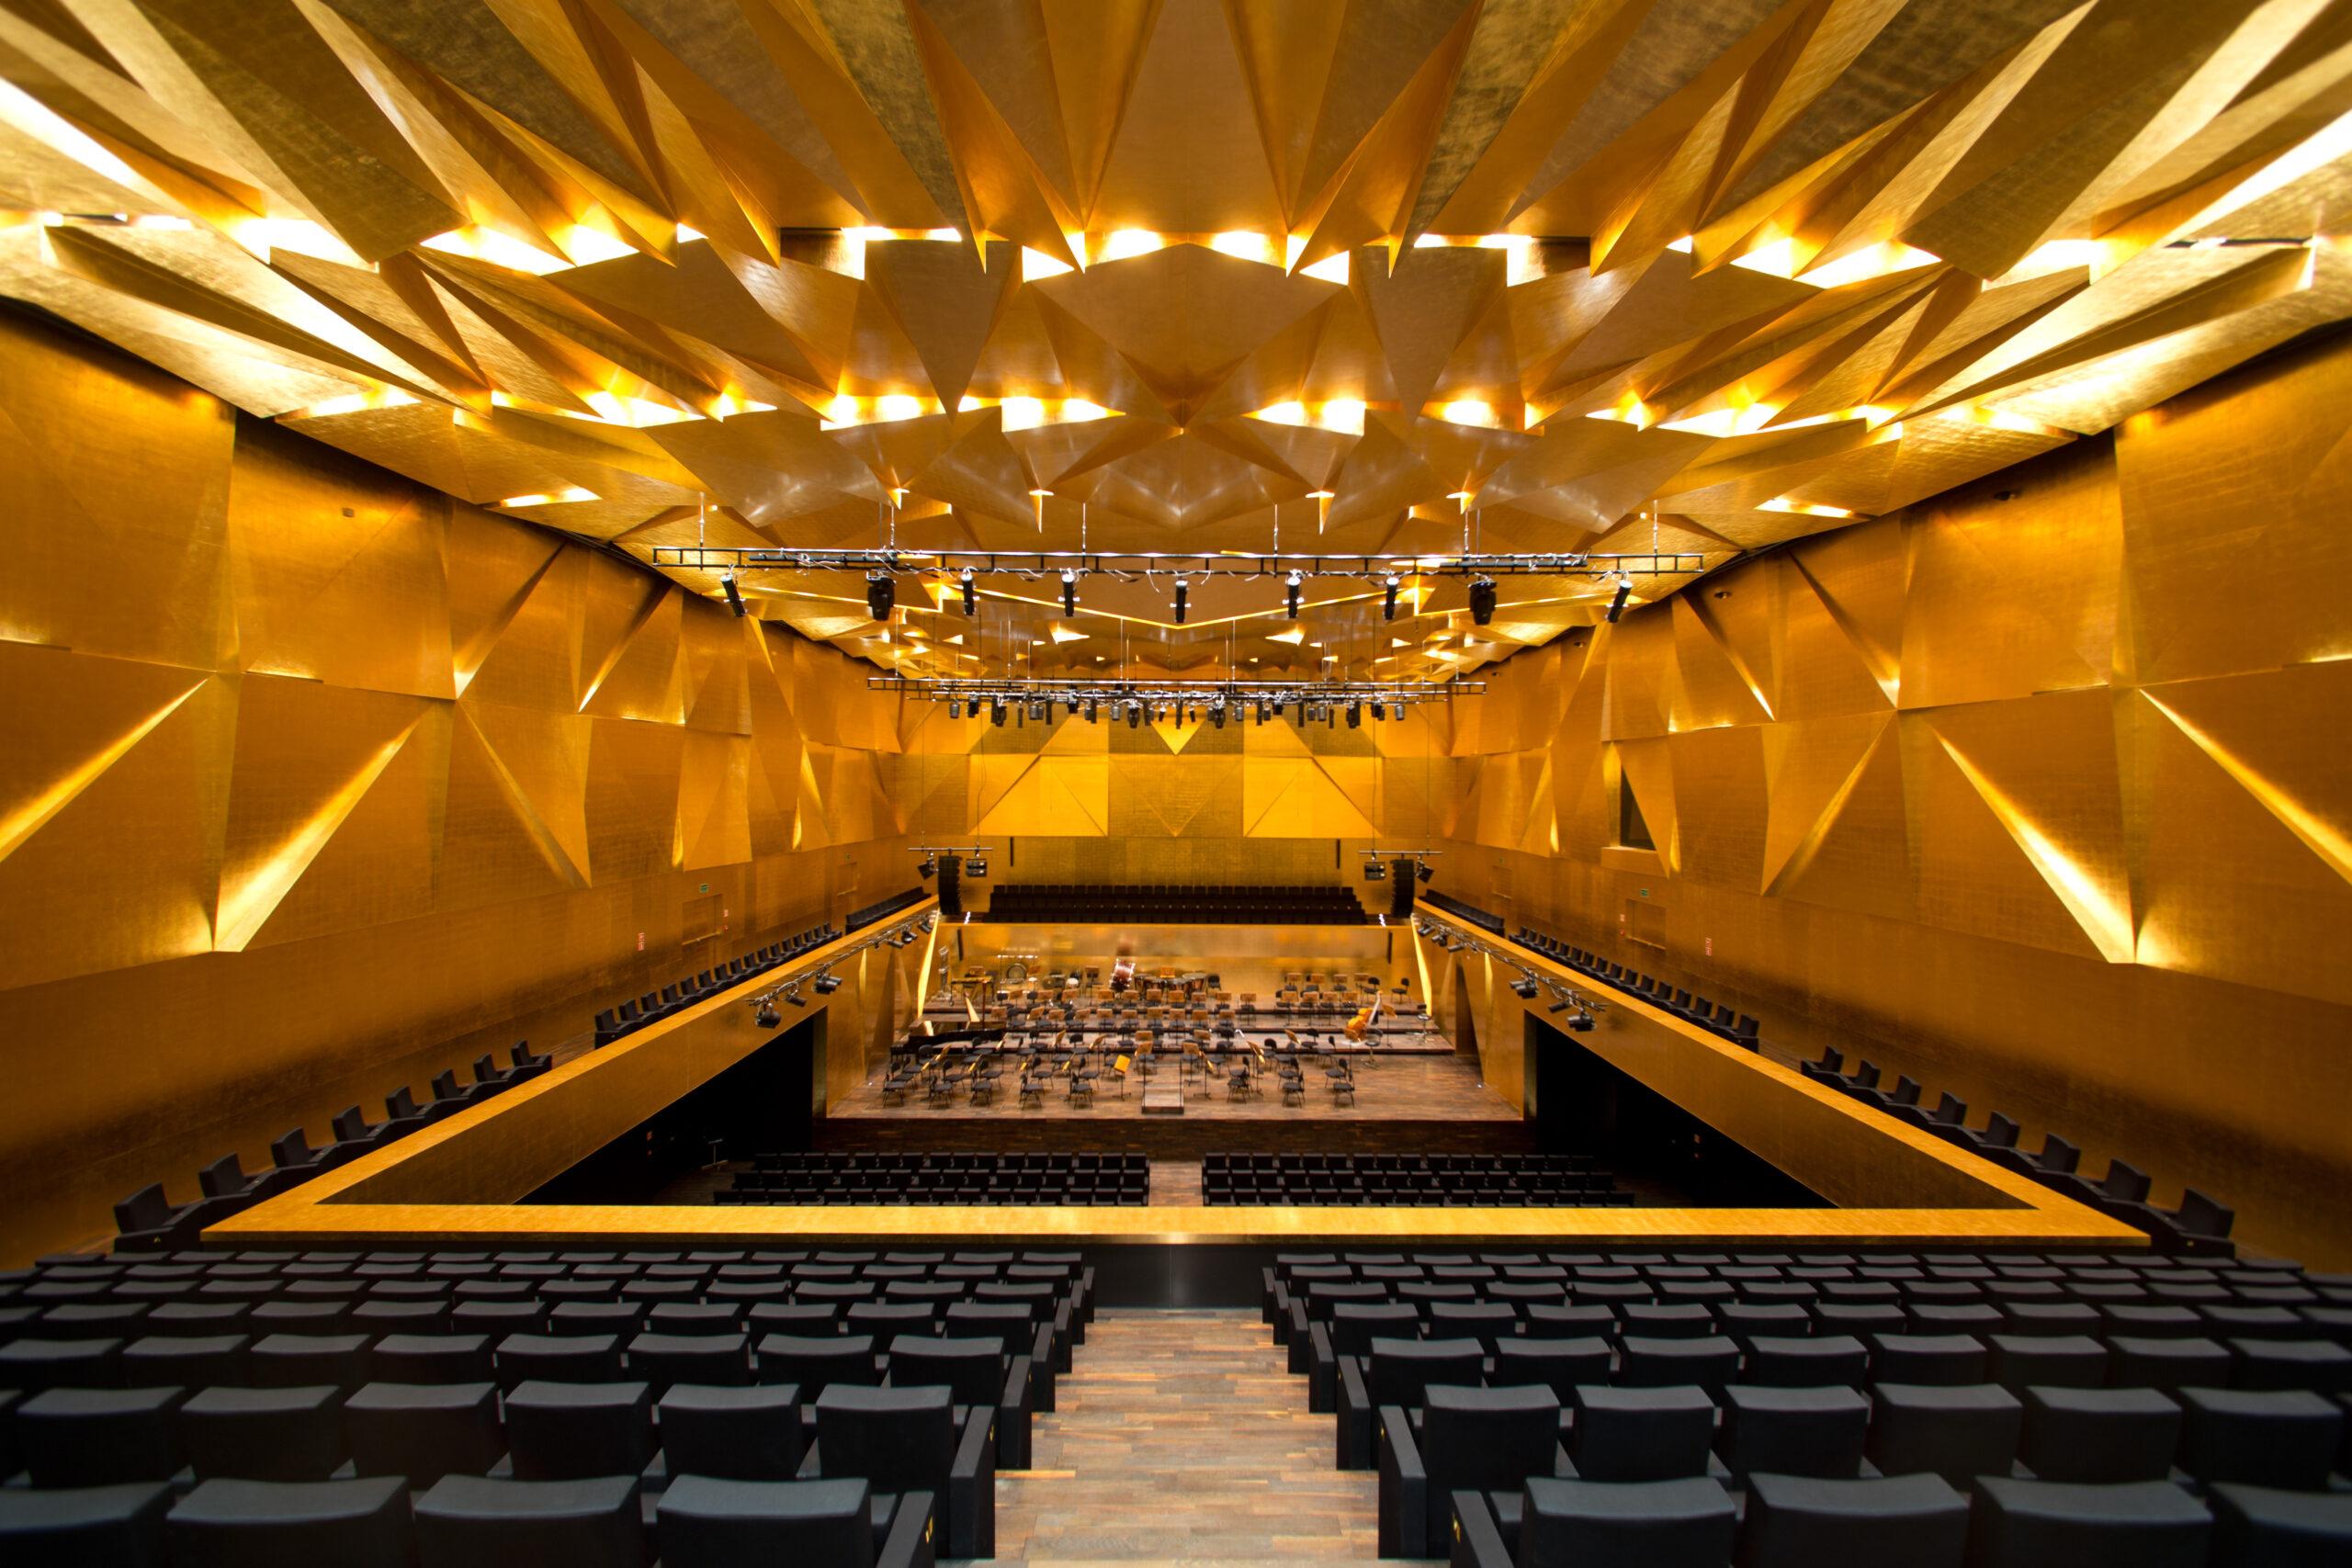 Chopin, Schumann i Beethoven w złotej sali